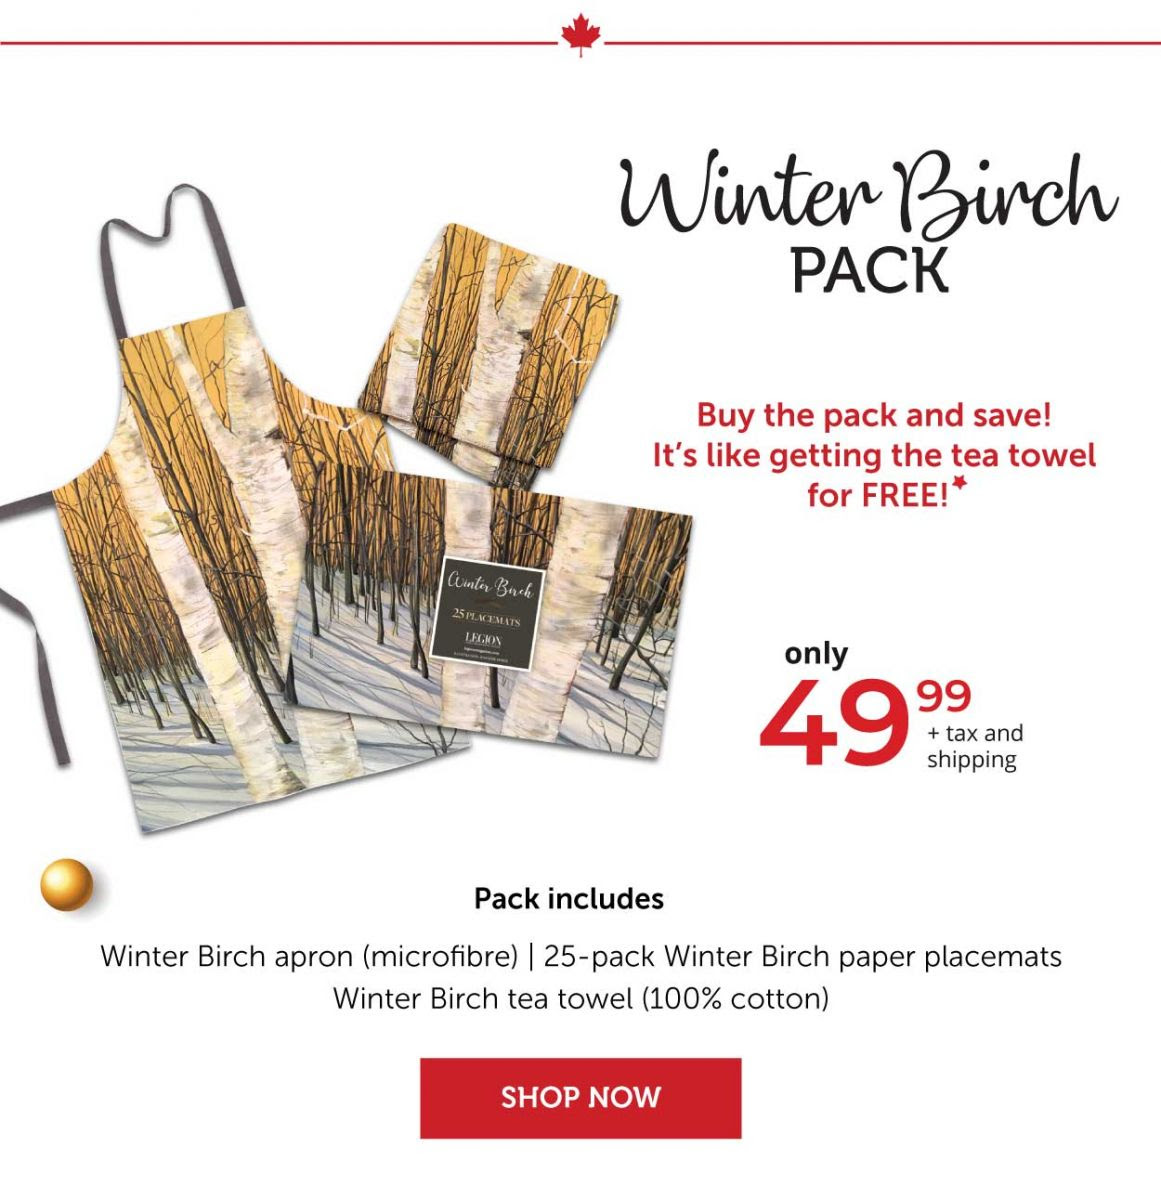 Winter Birch Pack